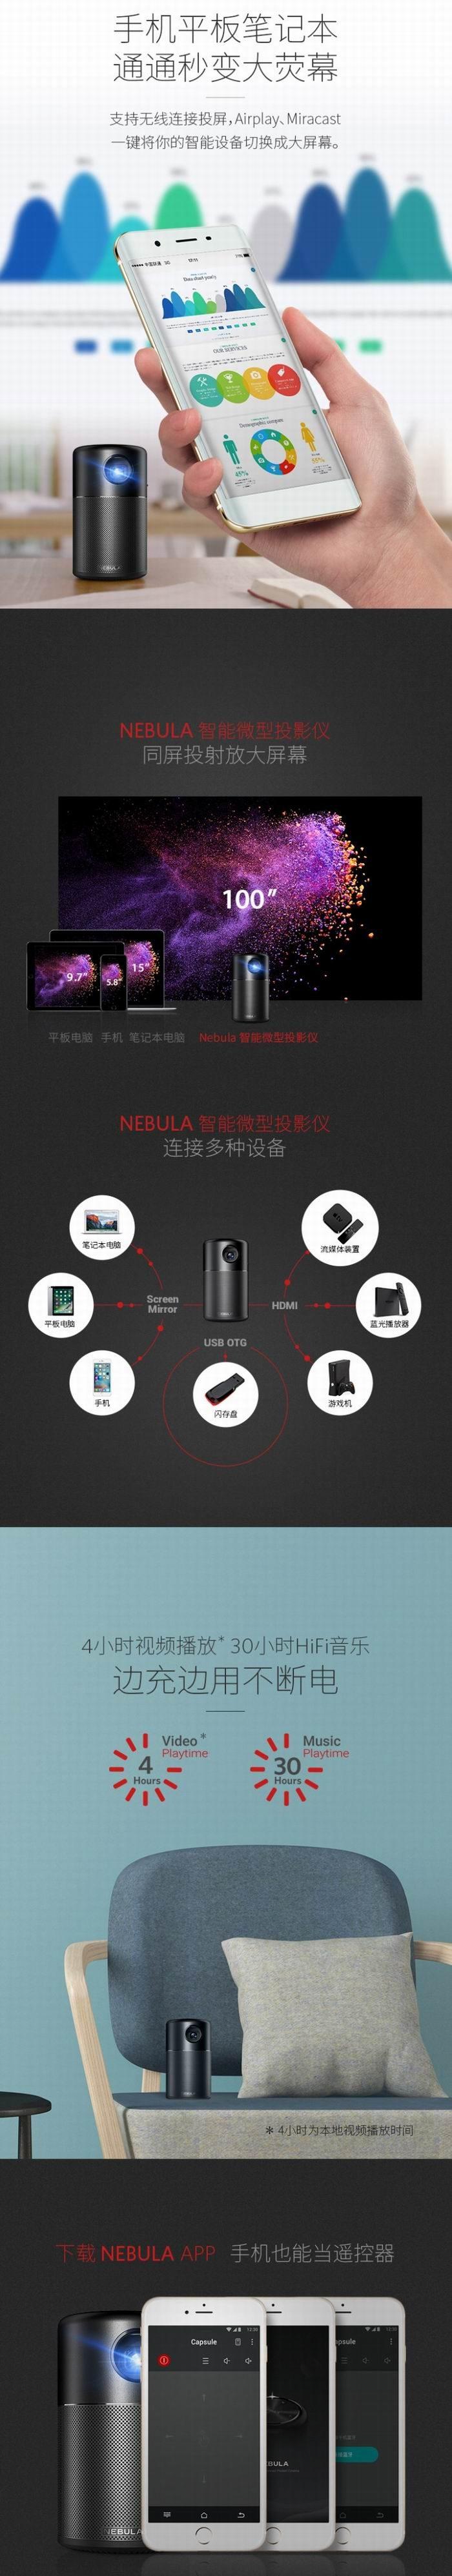 Anker Nebula Capsule 智能掌上Wi-Fi投影机 399.99加元包邮!